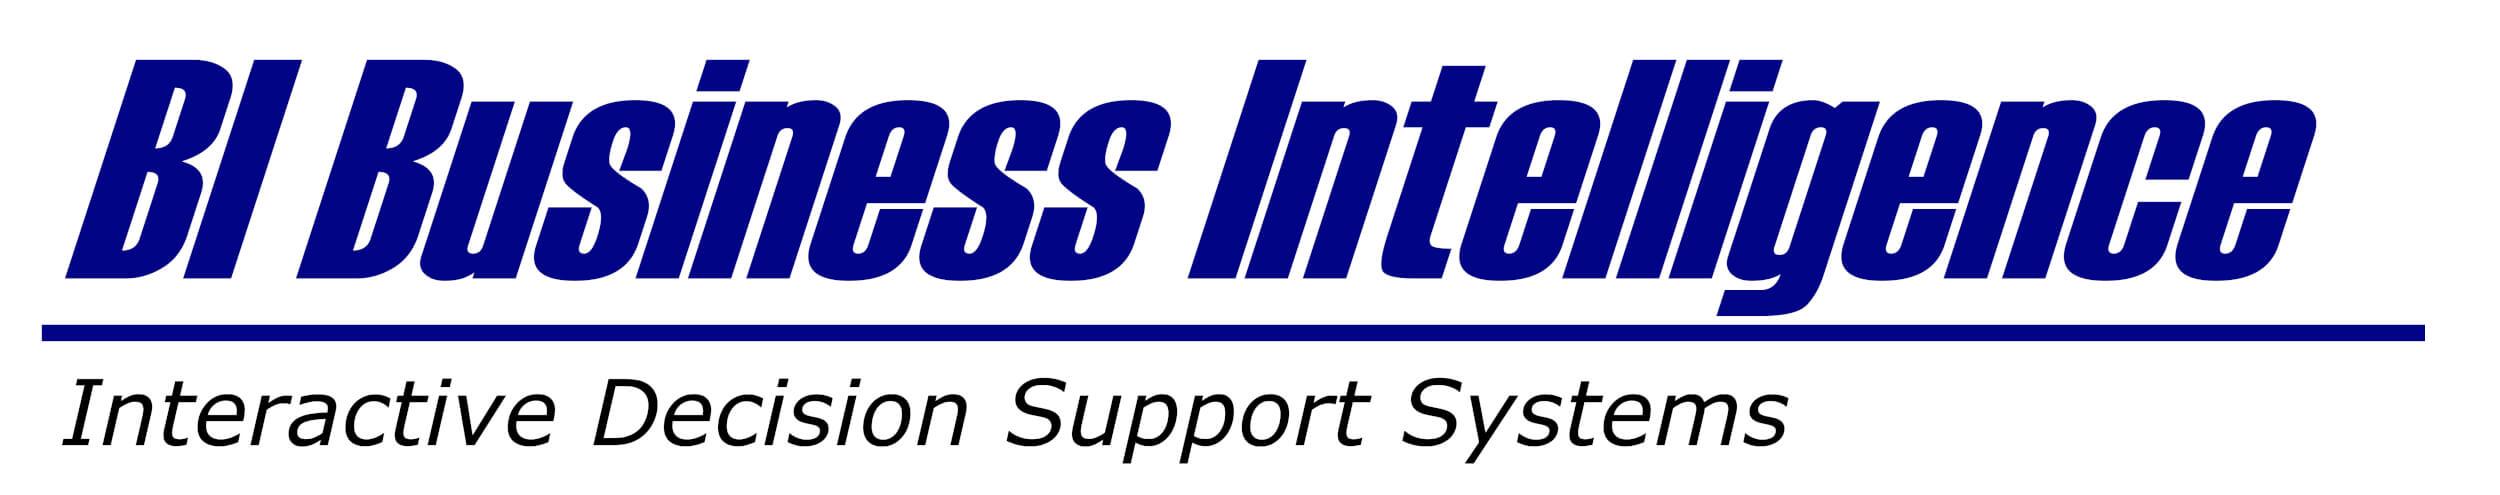 Business_Intelligence_Logo (c) bi-web.de